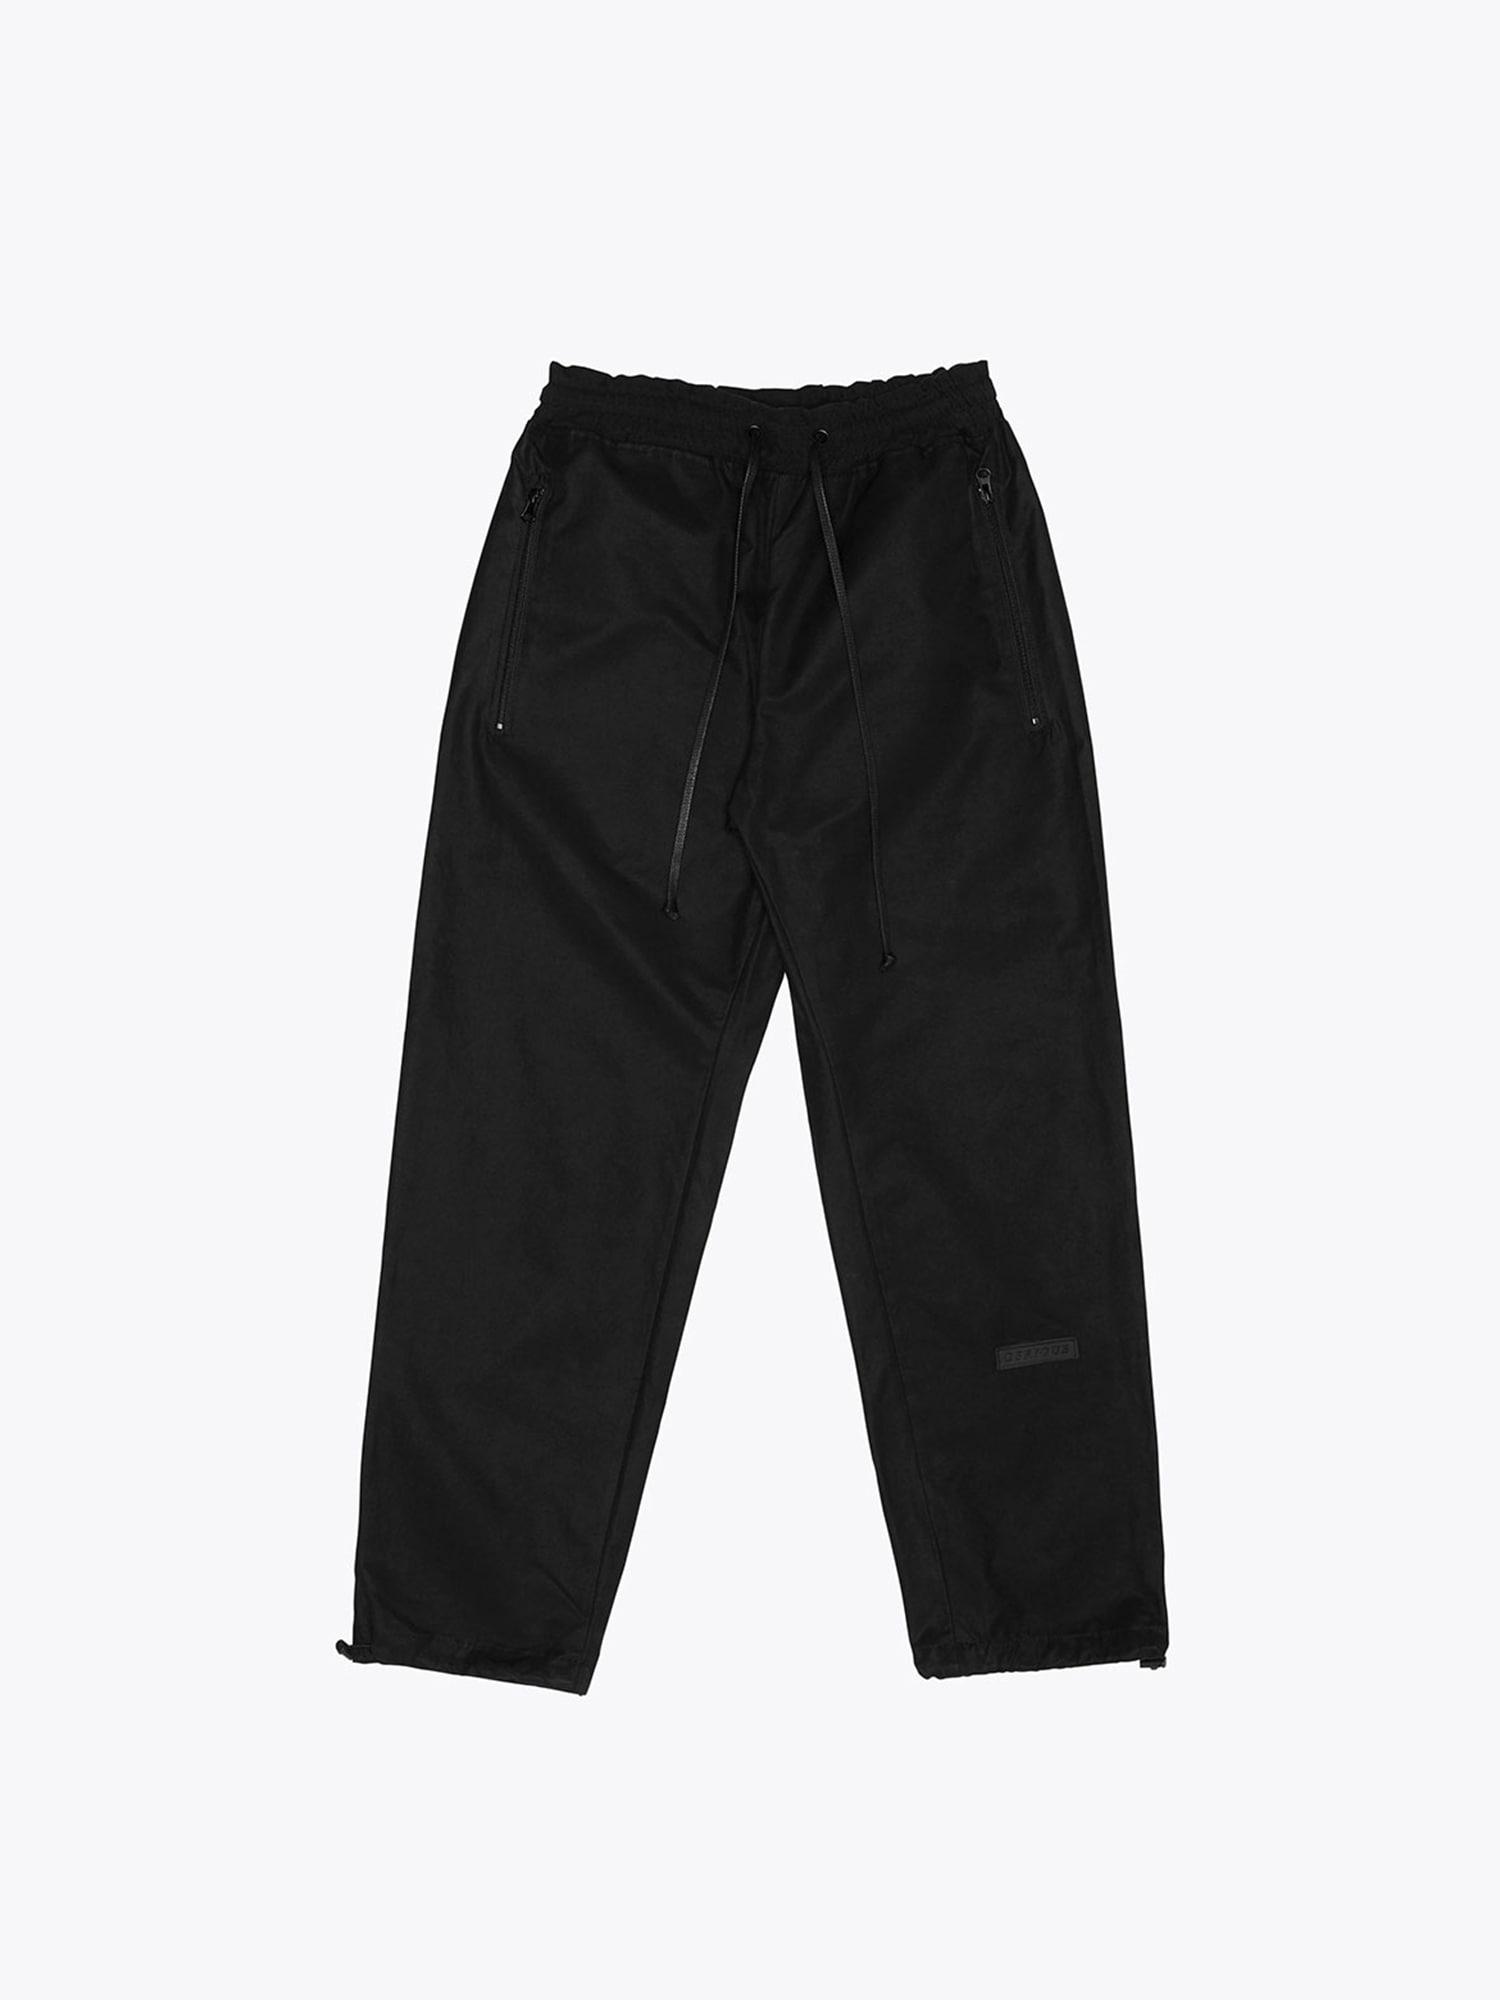 08 Cotton Track Pants - Black